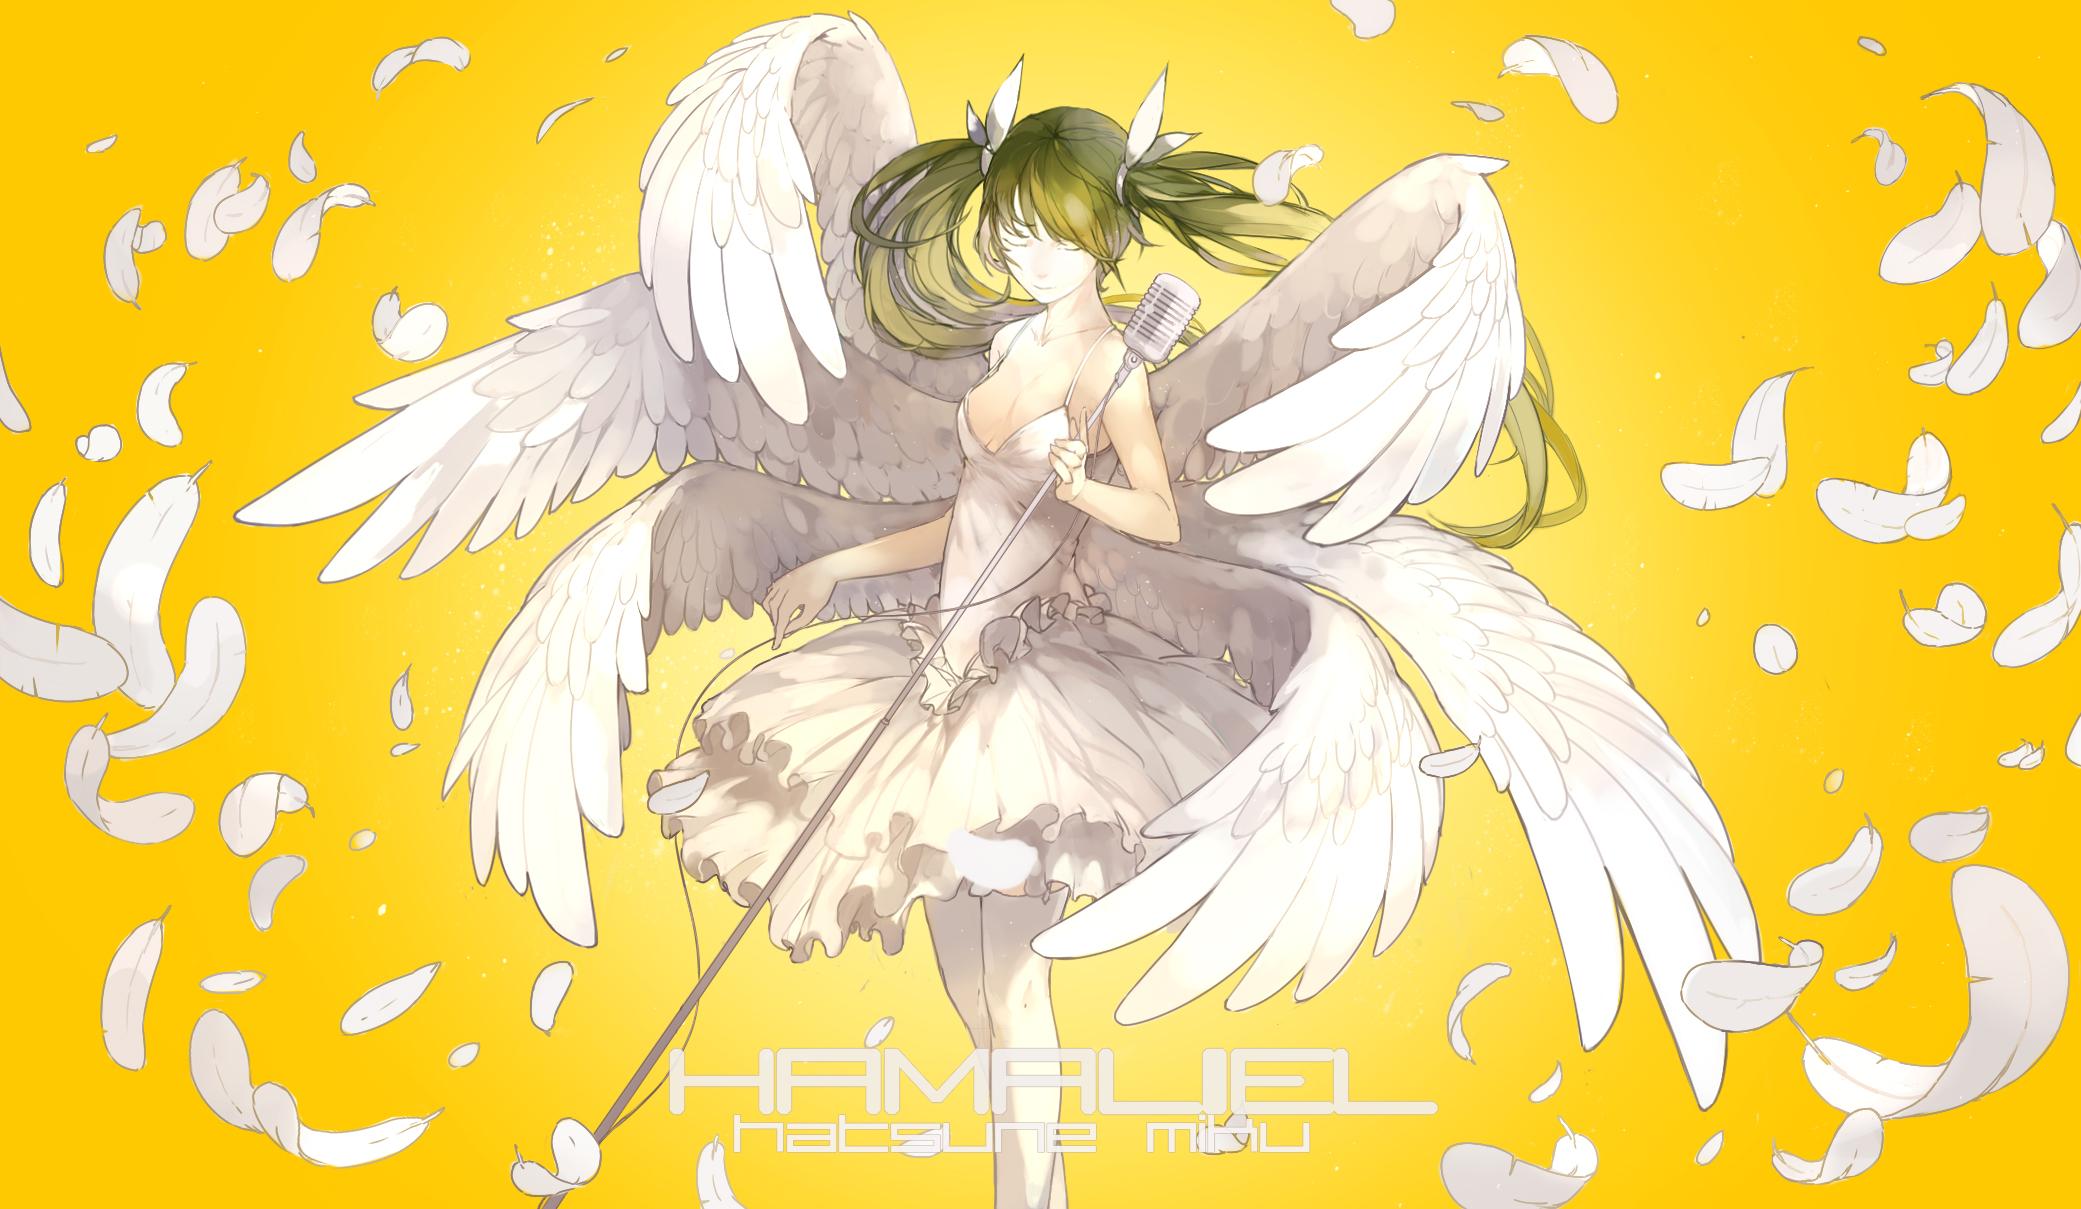 http://static.zerochan.net/Hatsune.Miku.full.1452708.jpg